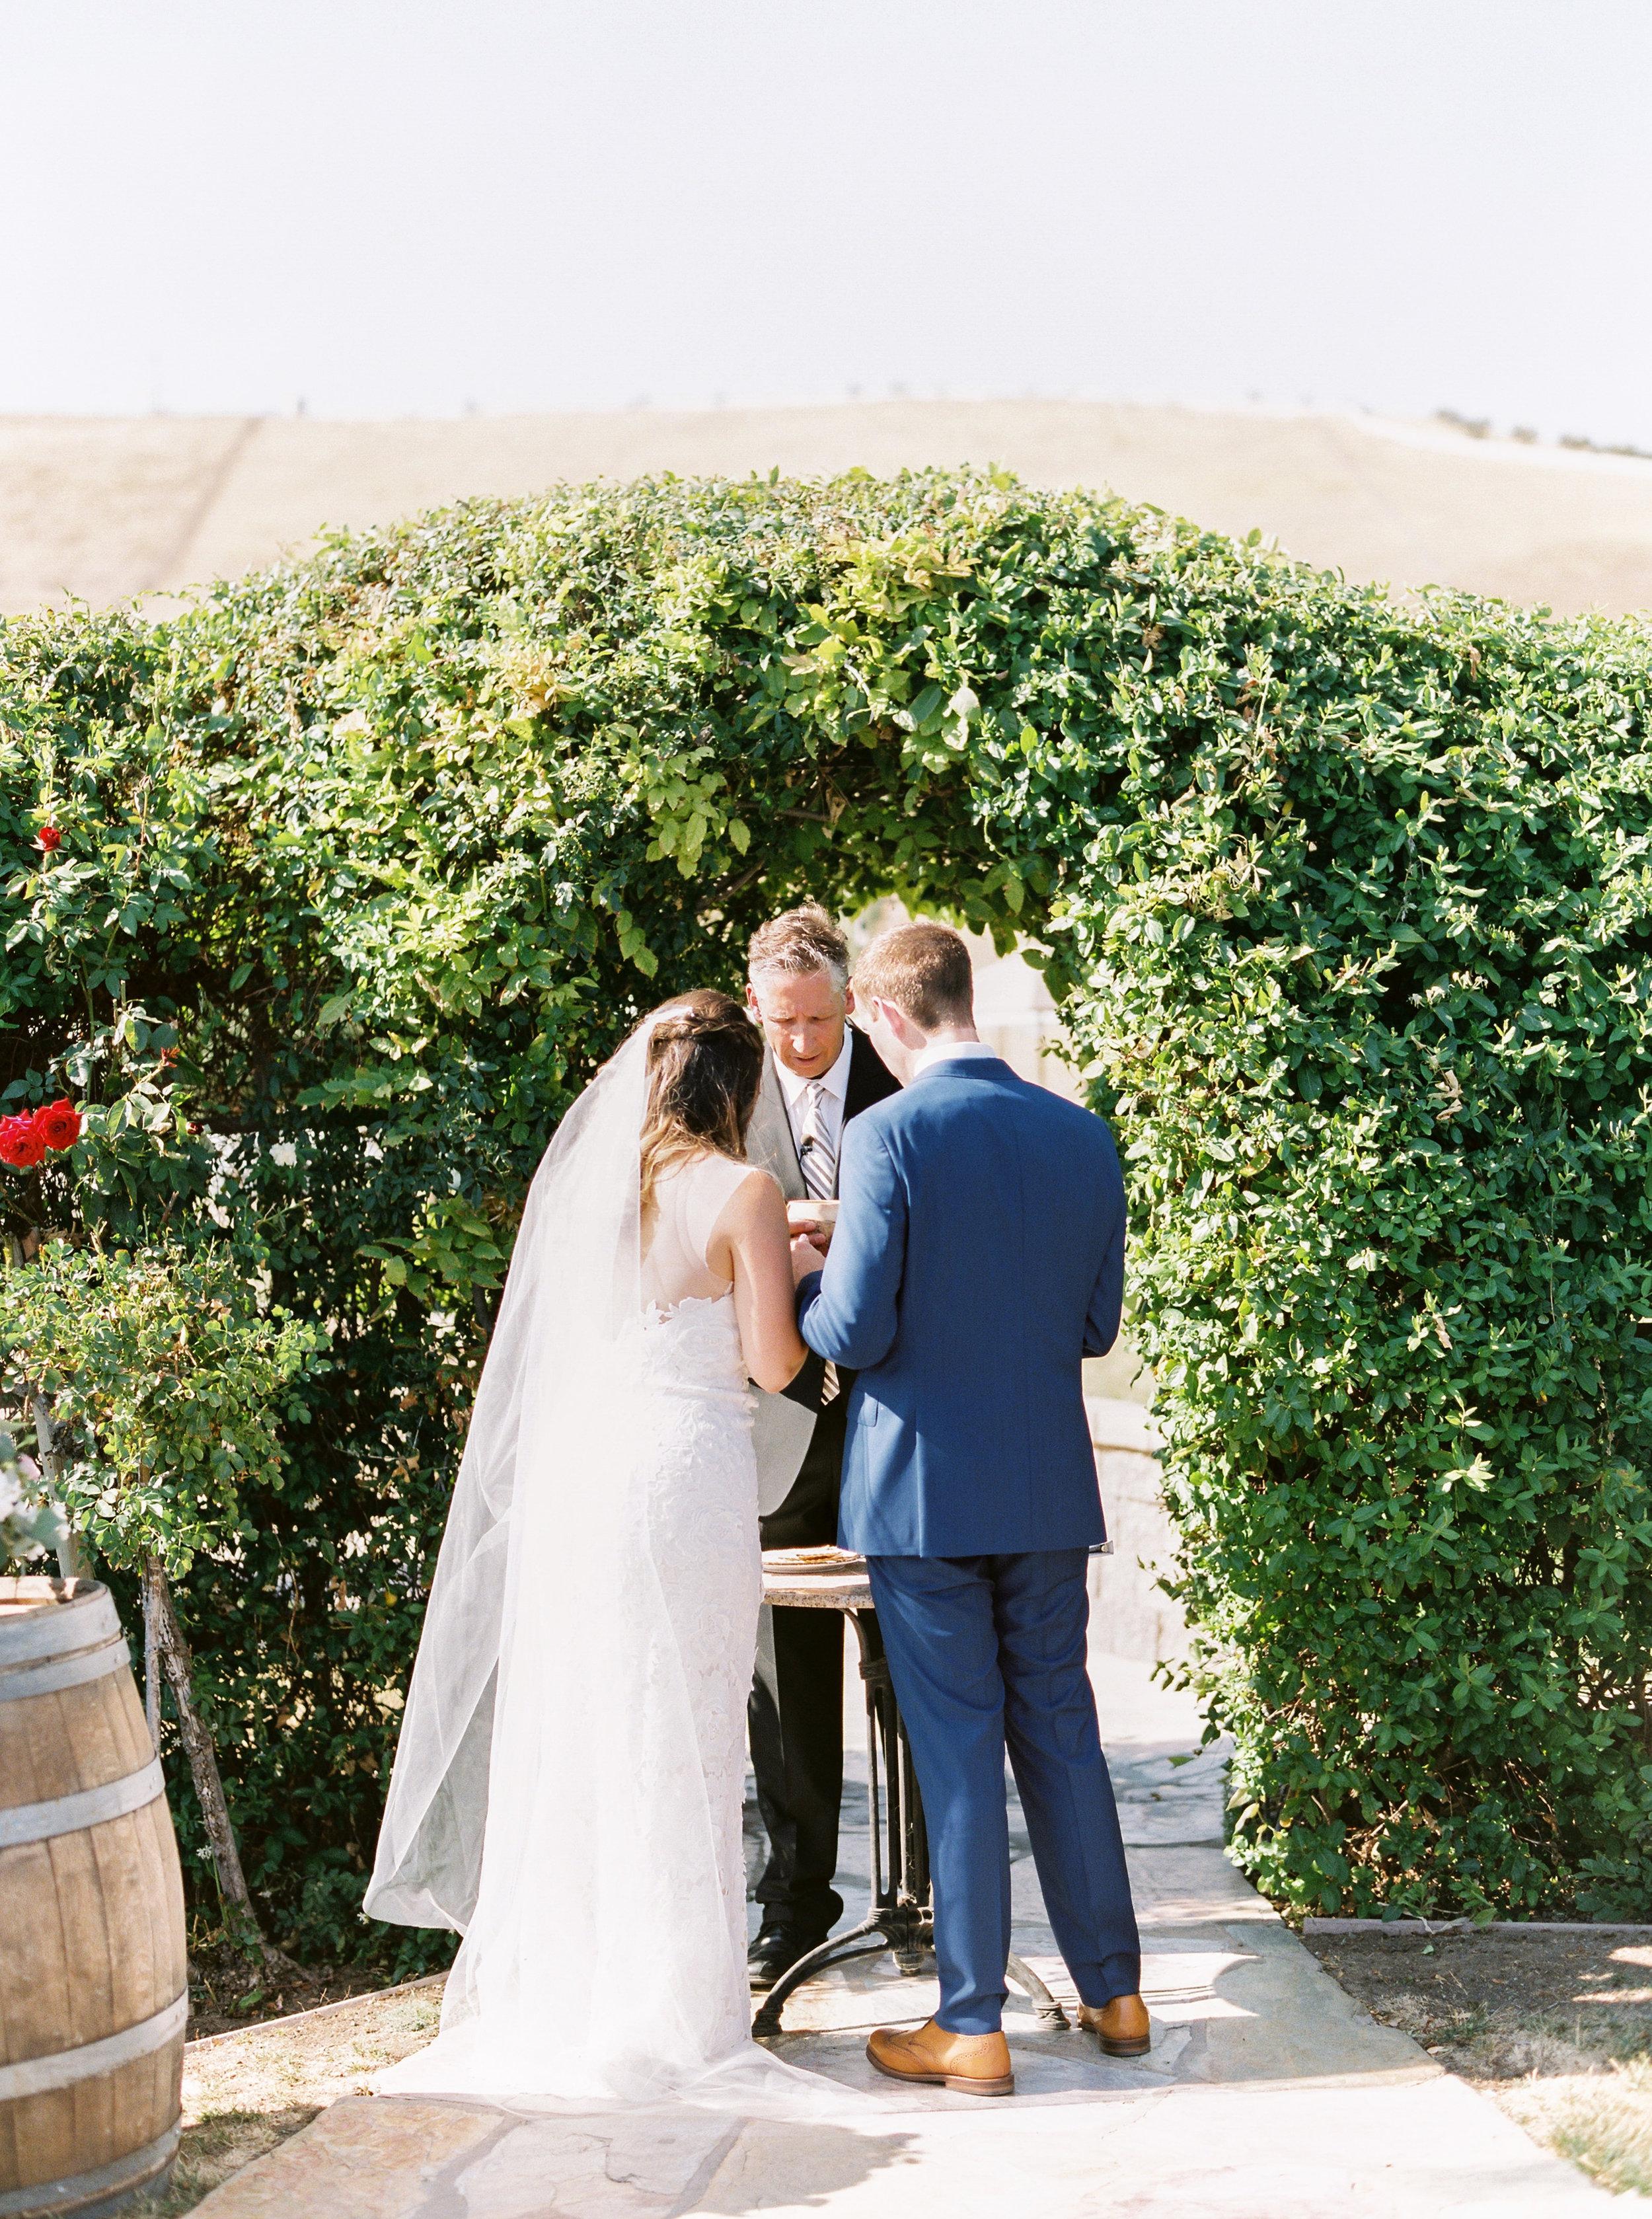 the-purple-orchid-resort-wedding-in-livermore-california-167.jpg